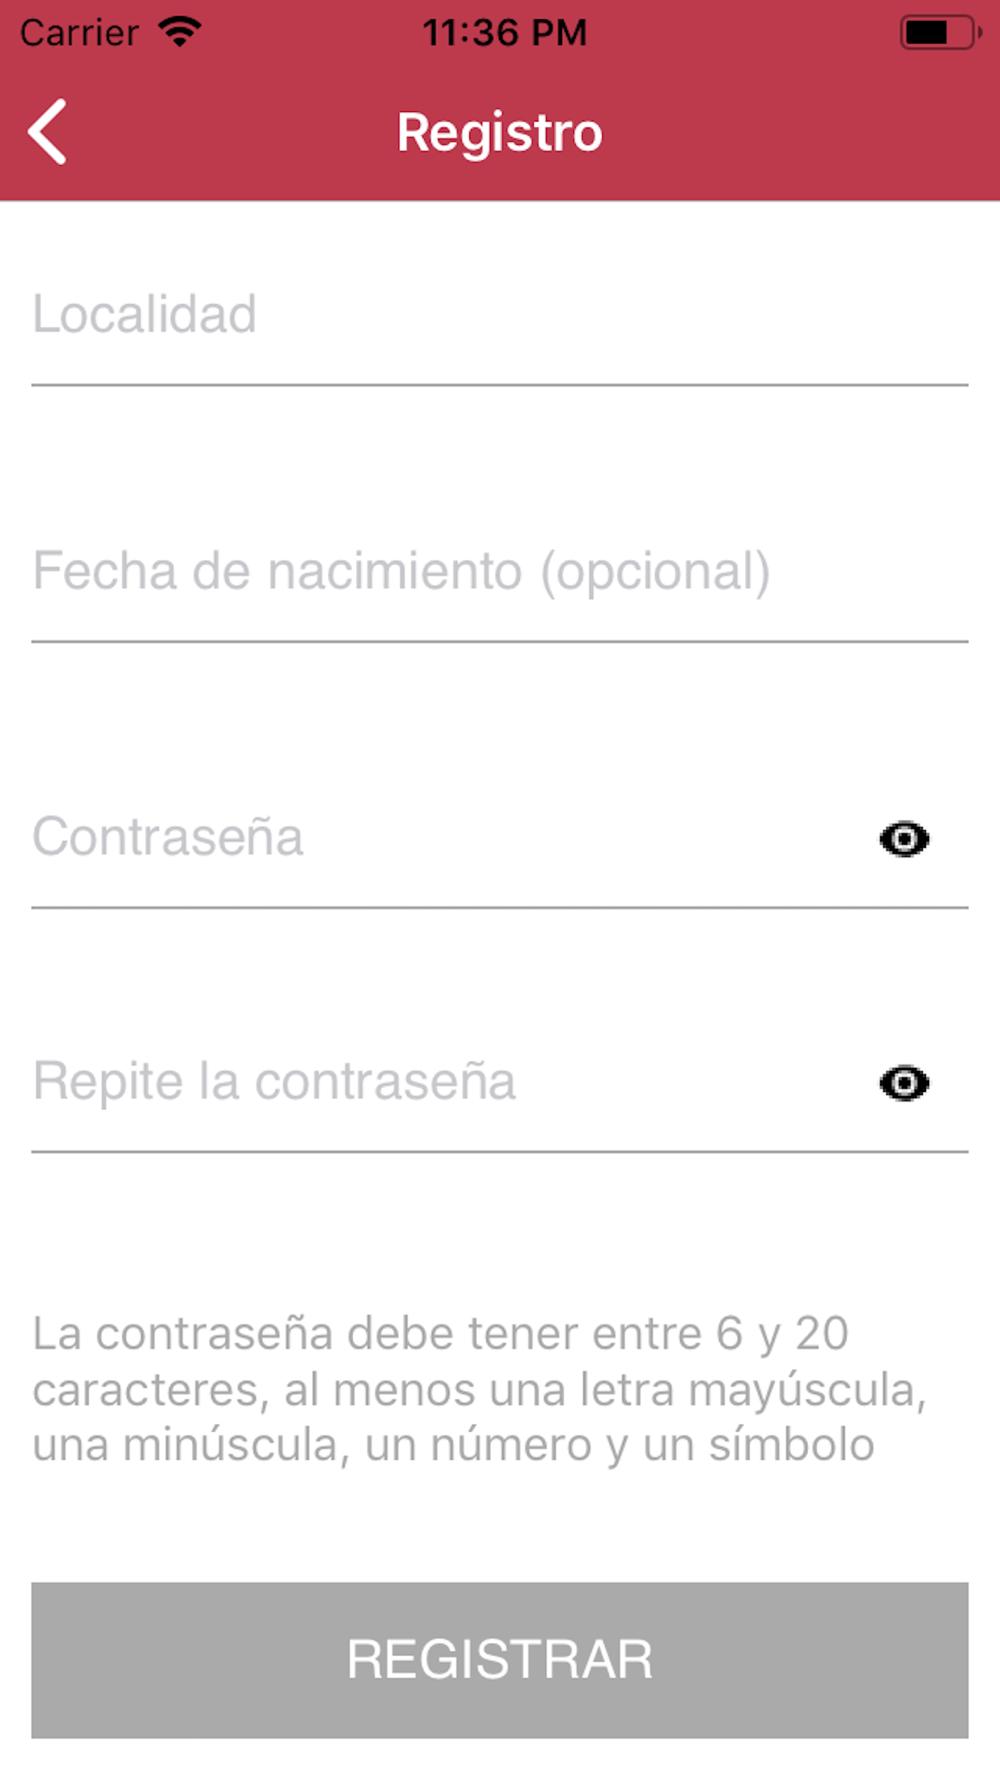 Bono Demanda Castilla Y Leon Free Download App For Iphone Steprimo Com